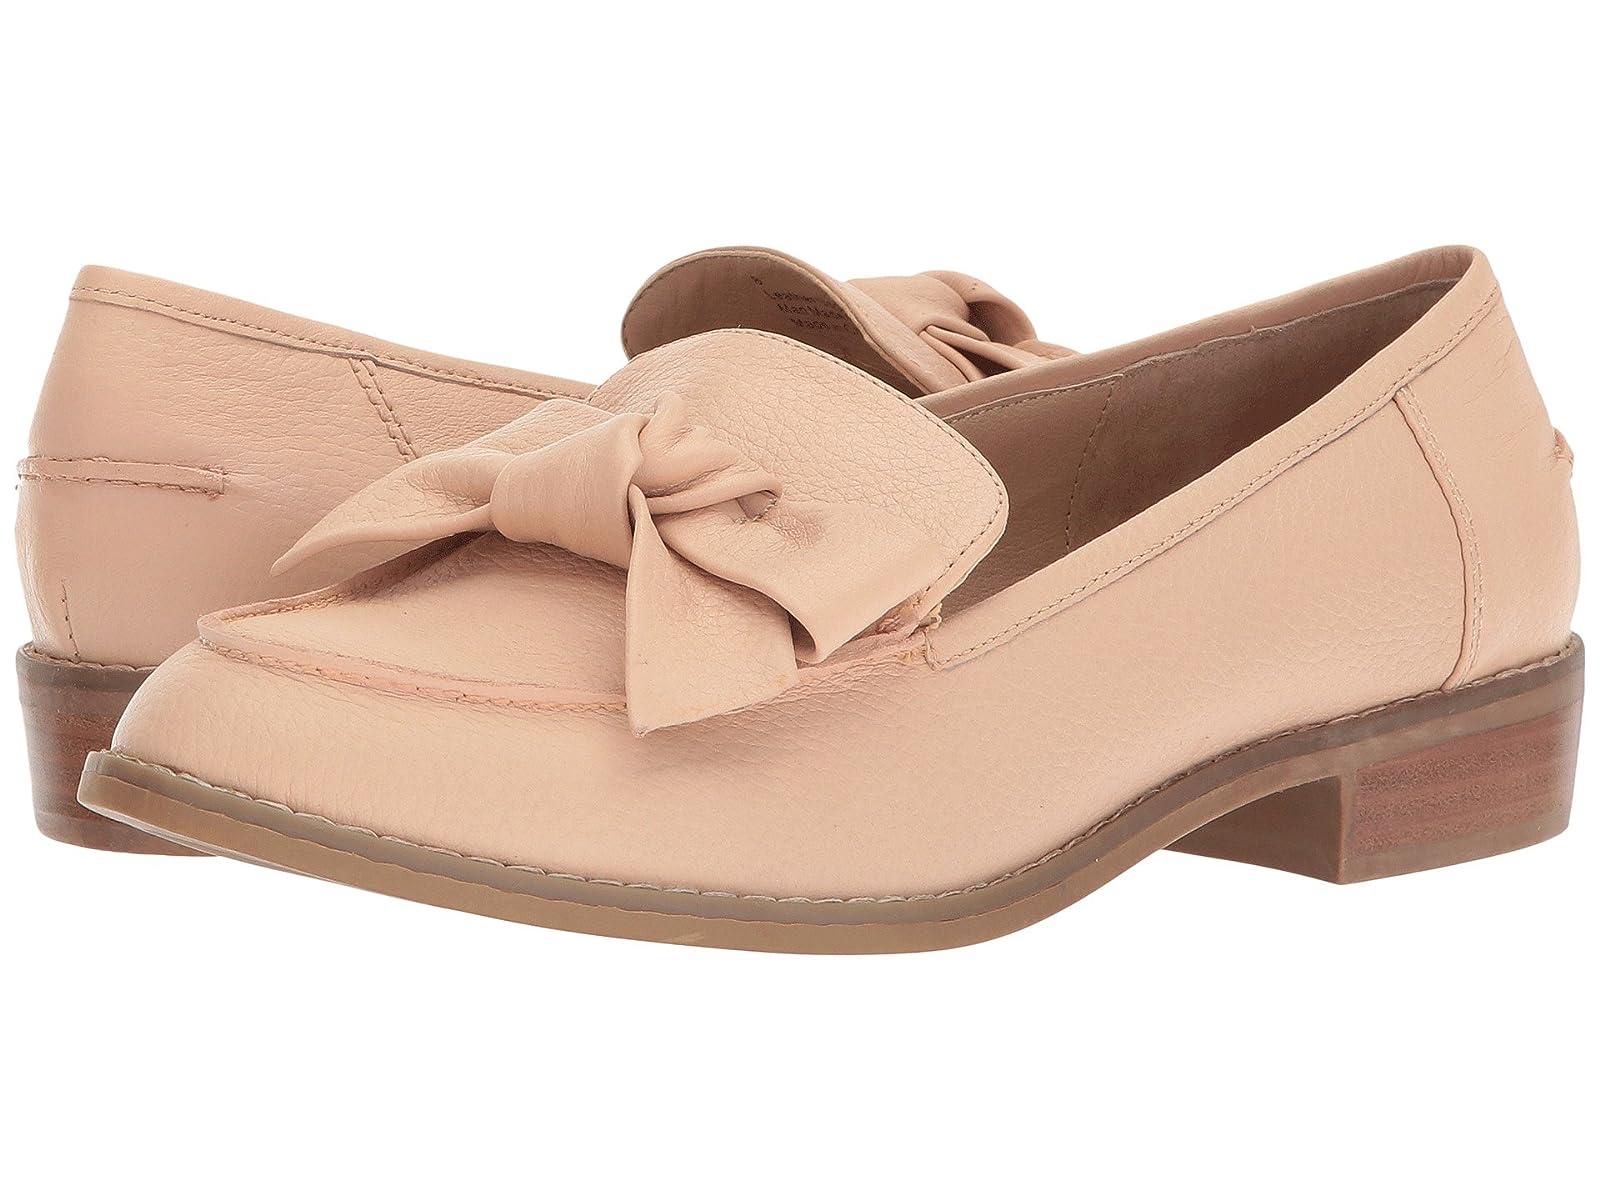 VOLATILE BeauxCheap and distinctive eye-catching shoes